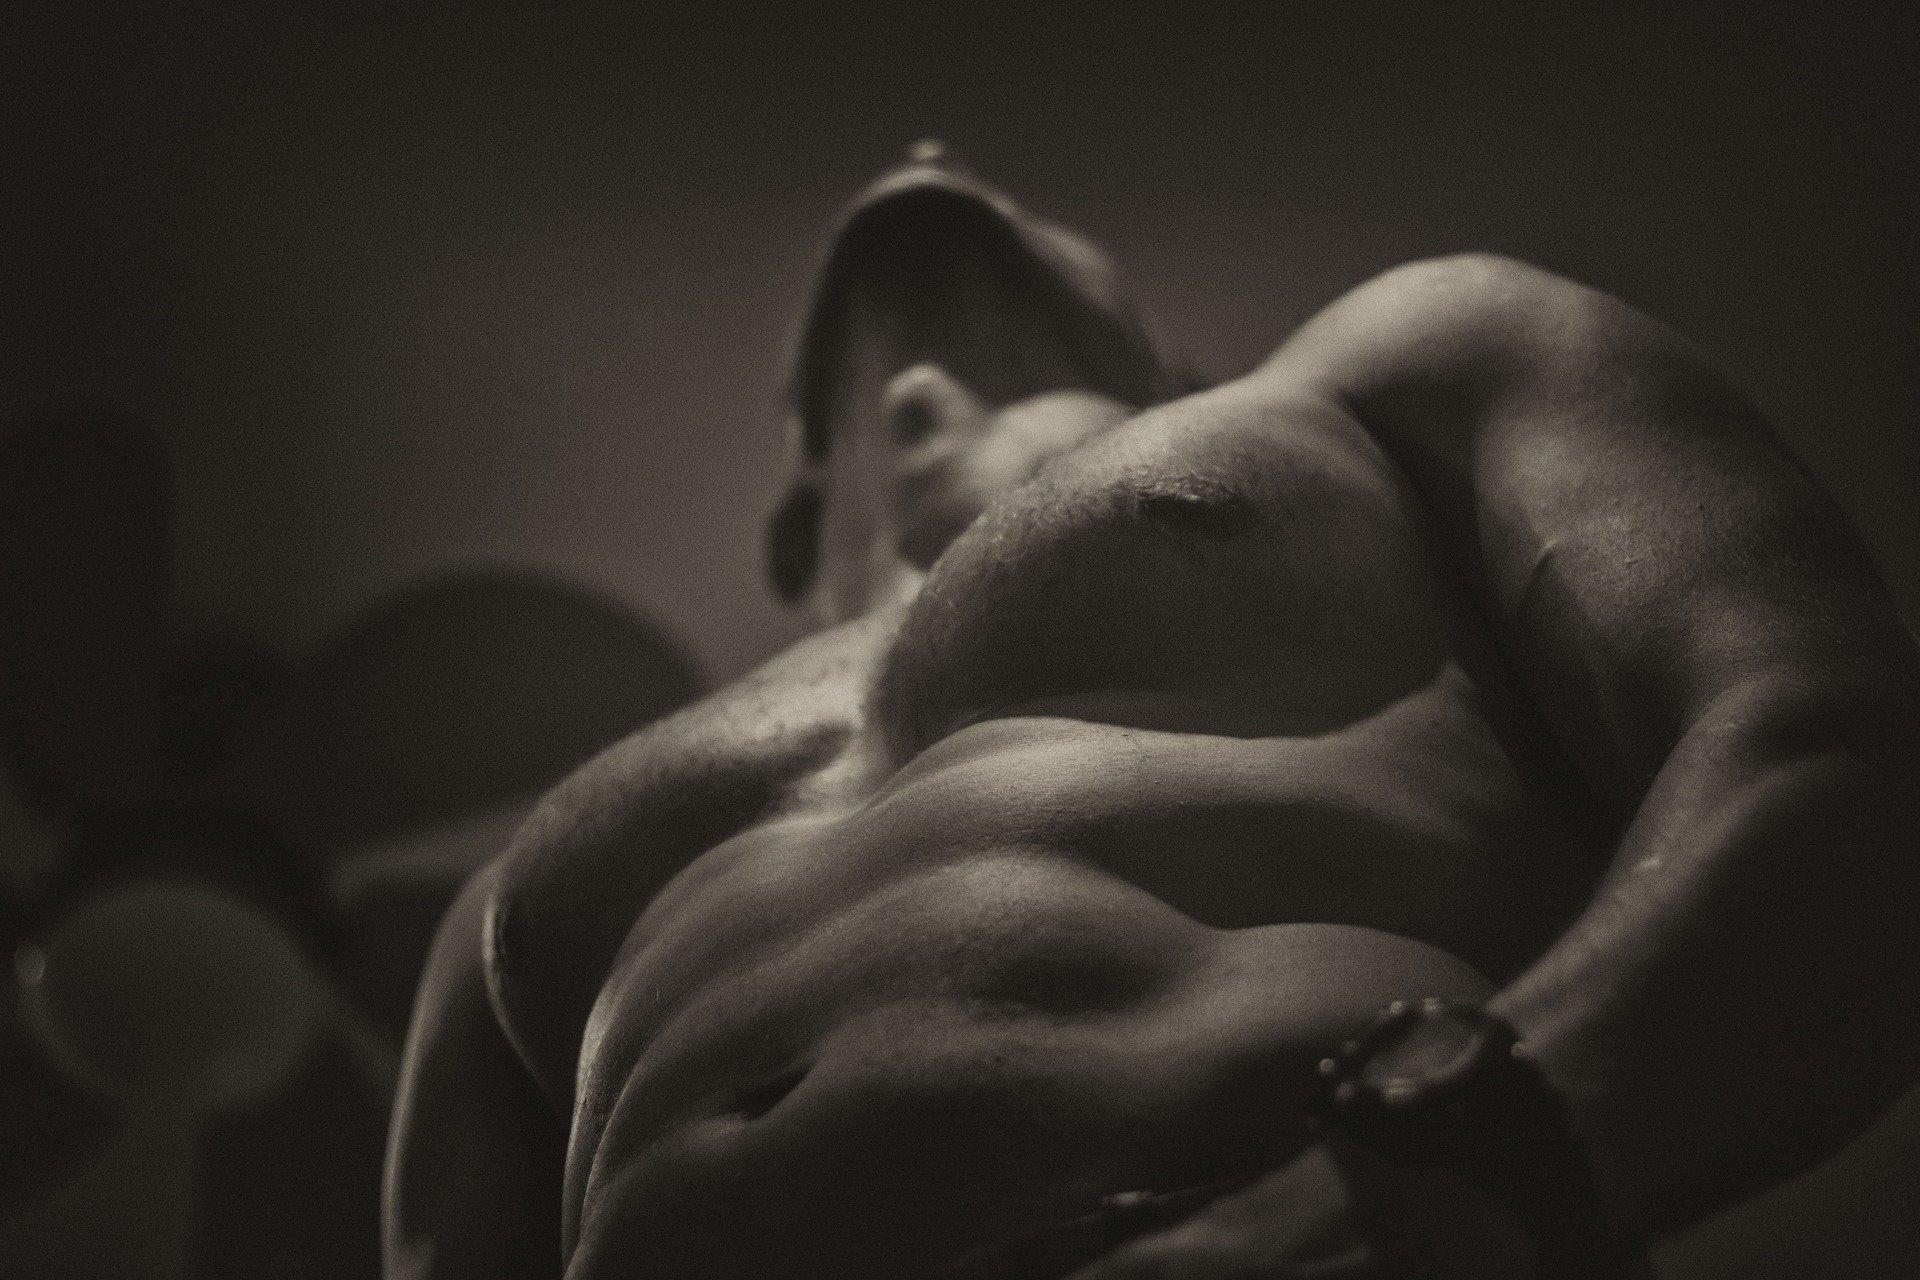 aumentar_testosterona_naturalmente